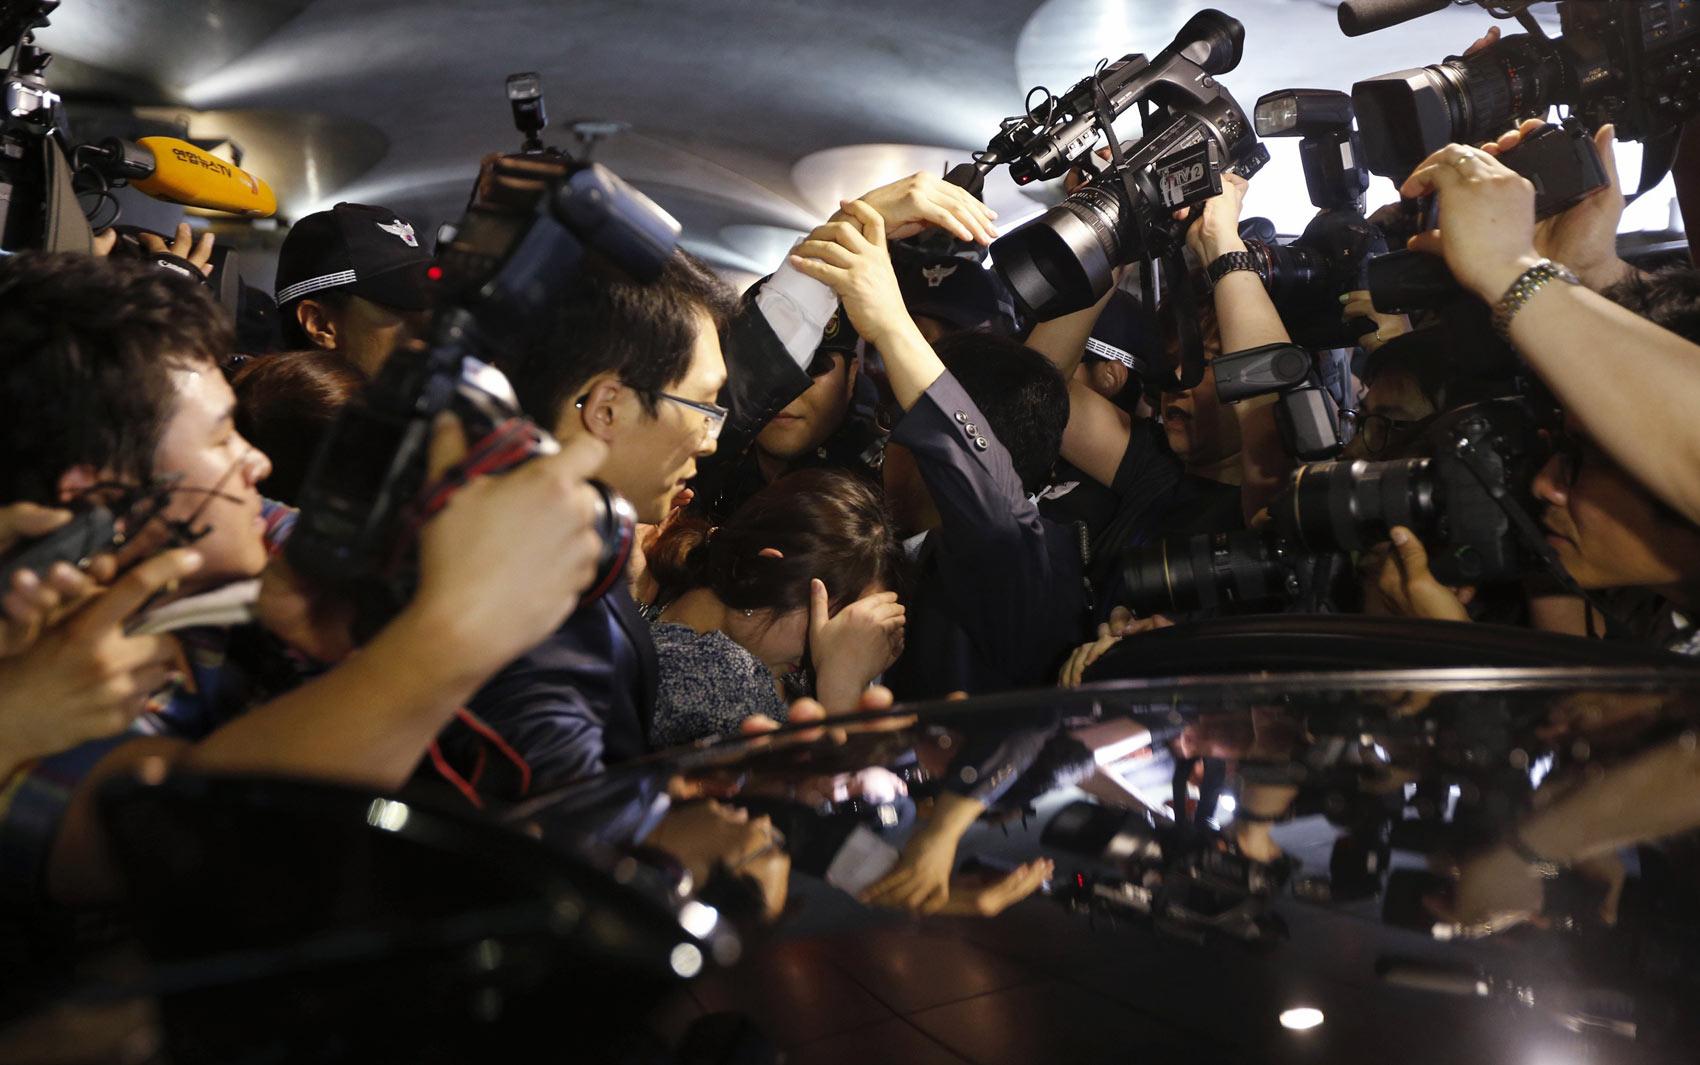 8/7 - Passageira é cercada por jornalistas ao chegar ao aeroporto de Seul, na Coreia do Sul